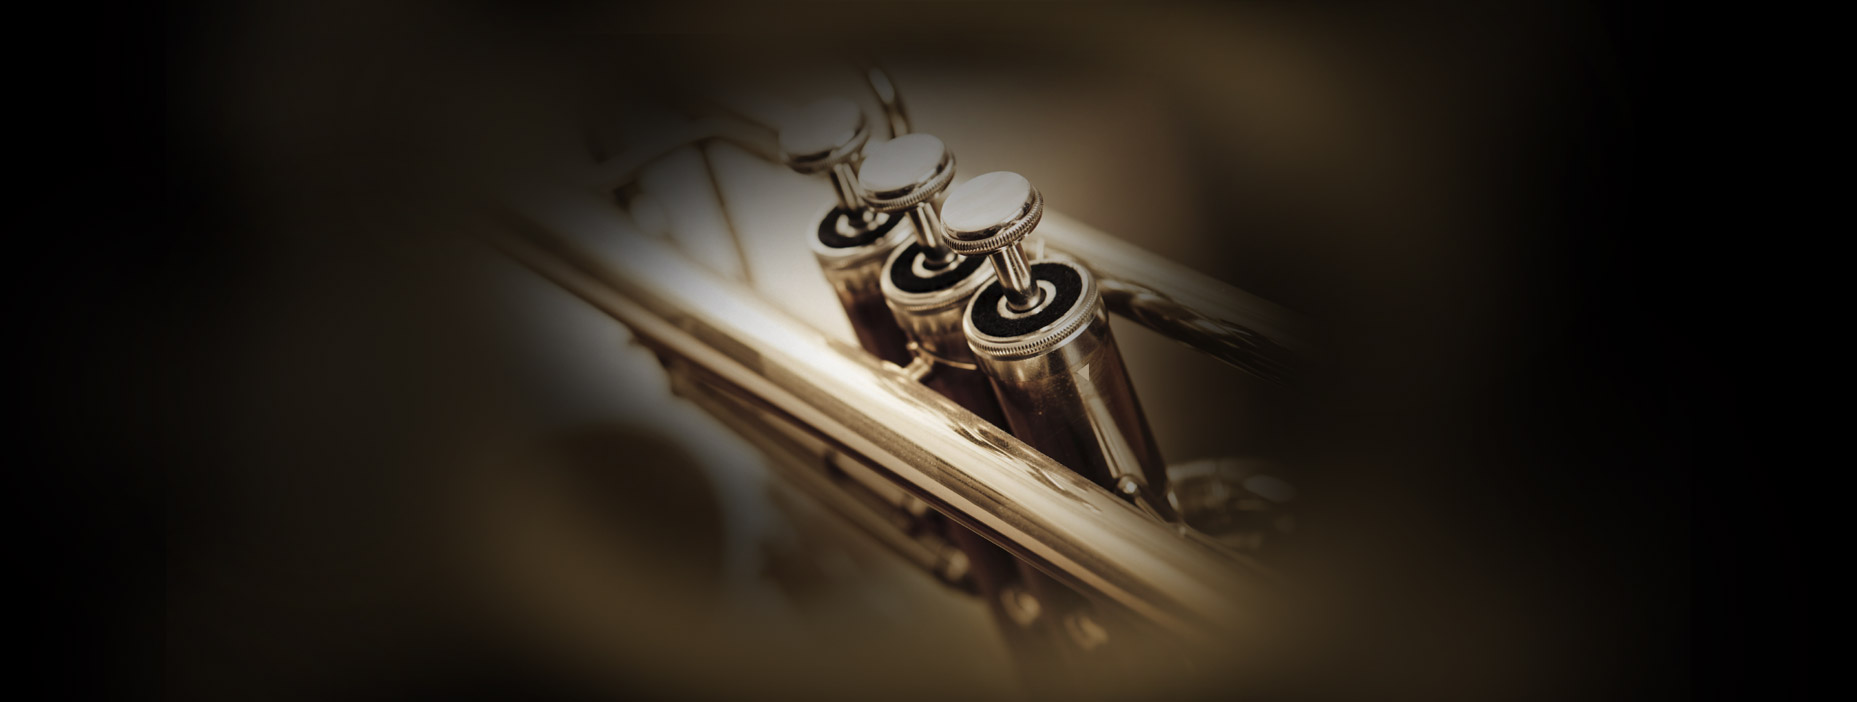 Videos da Empresa de Eventos Musicais Para Casamentos, Orquestra e Coral, Corporativo